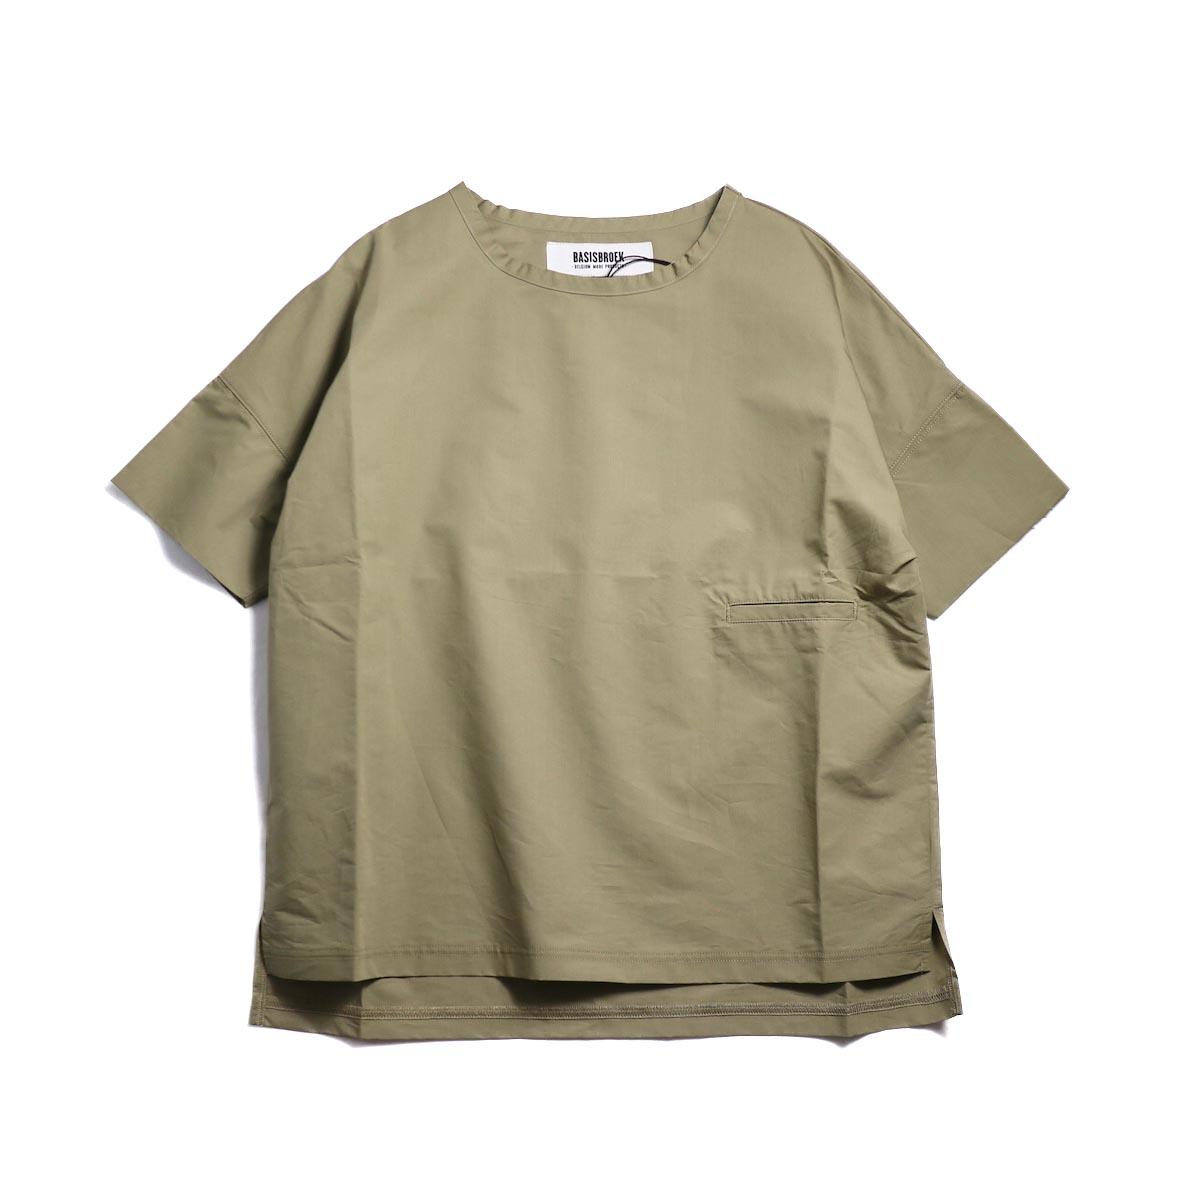 BASISBROEK / REMI -Cotton Silk PO Shirt (CHINO)